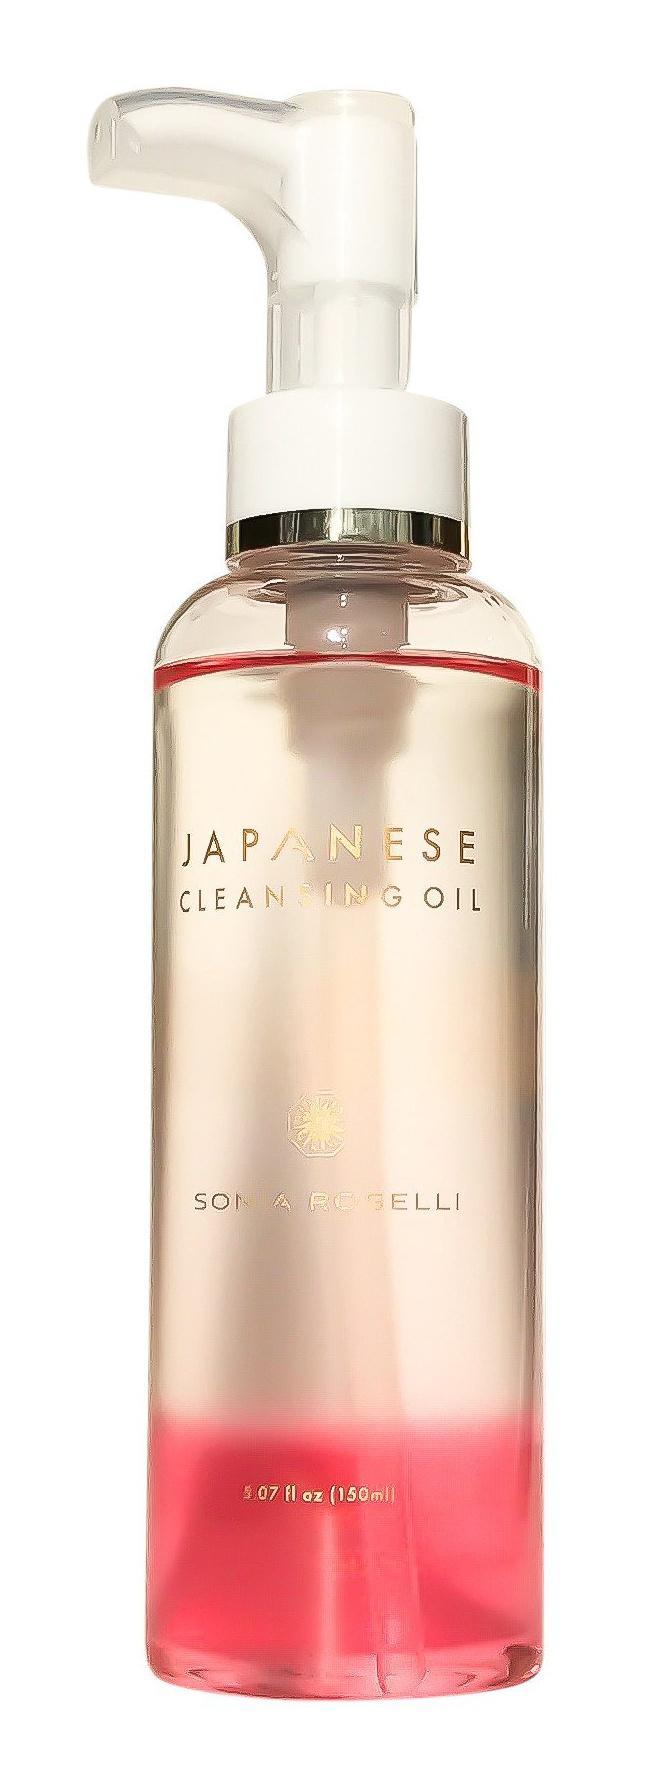 Sonia Roselli Japanese Cleansing Oil